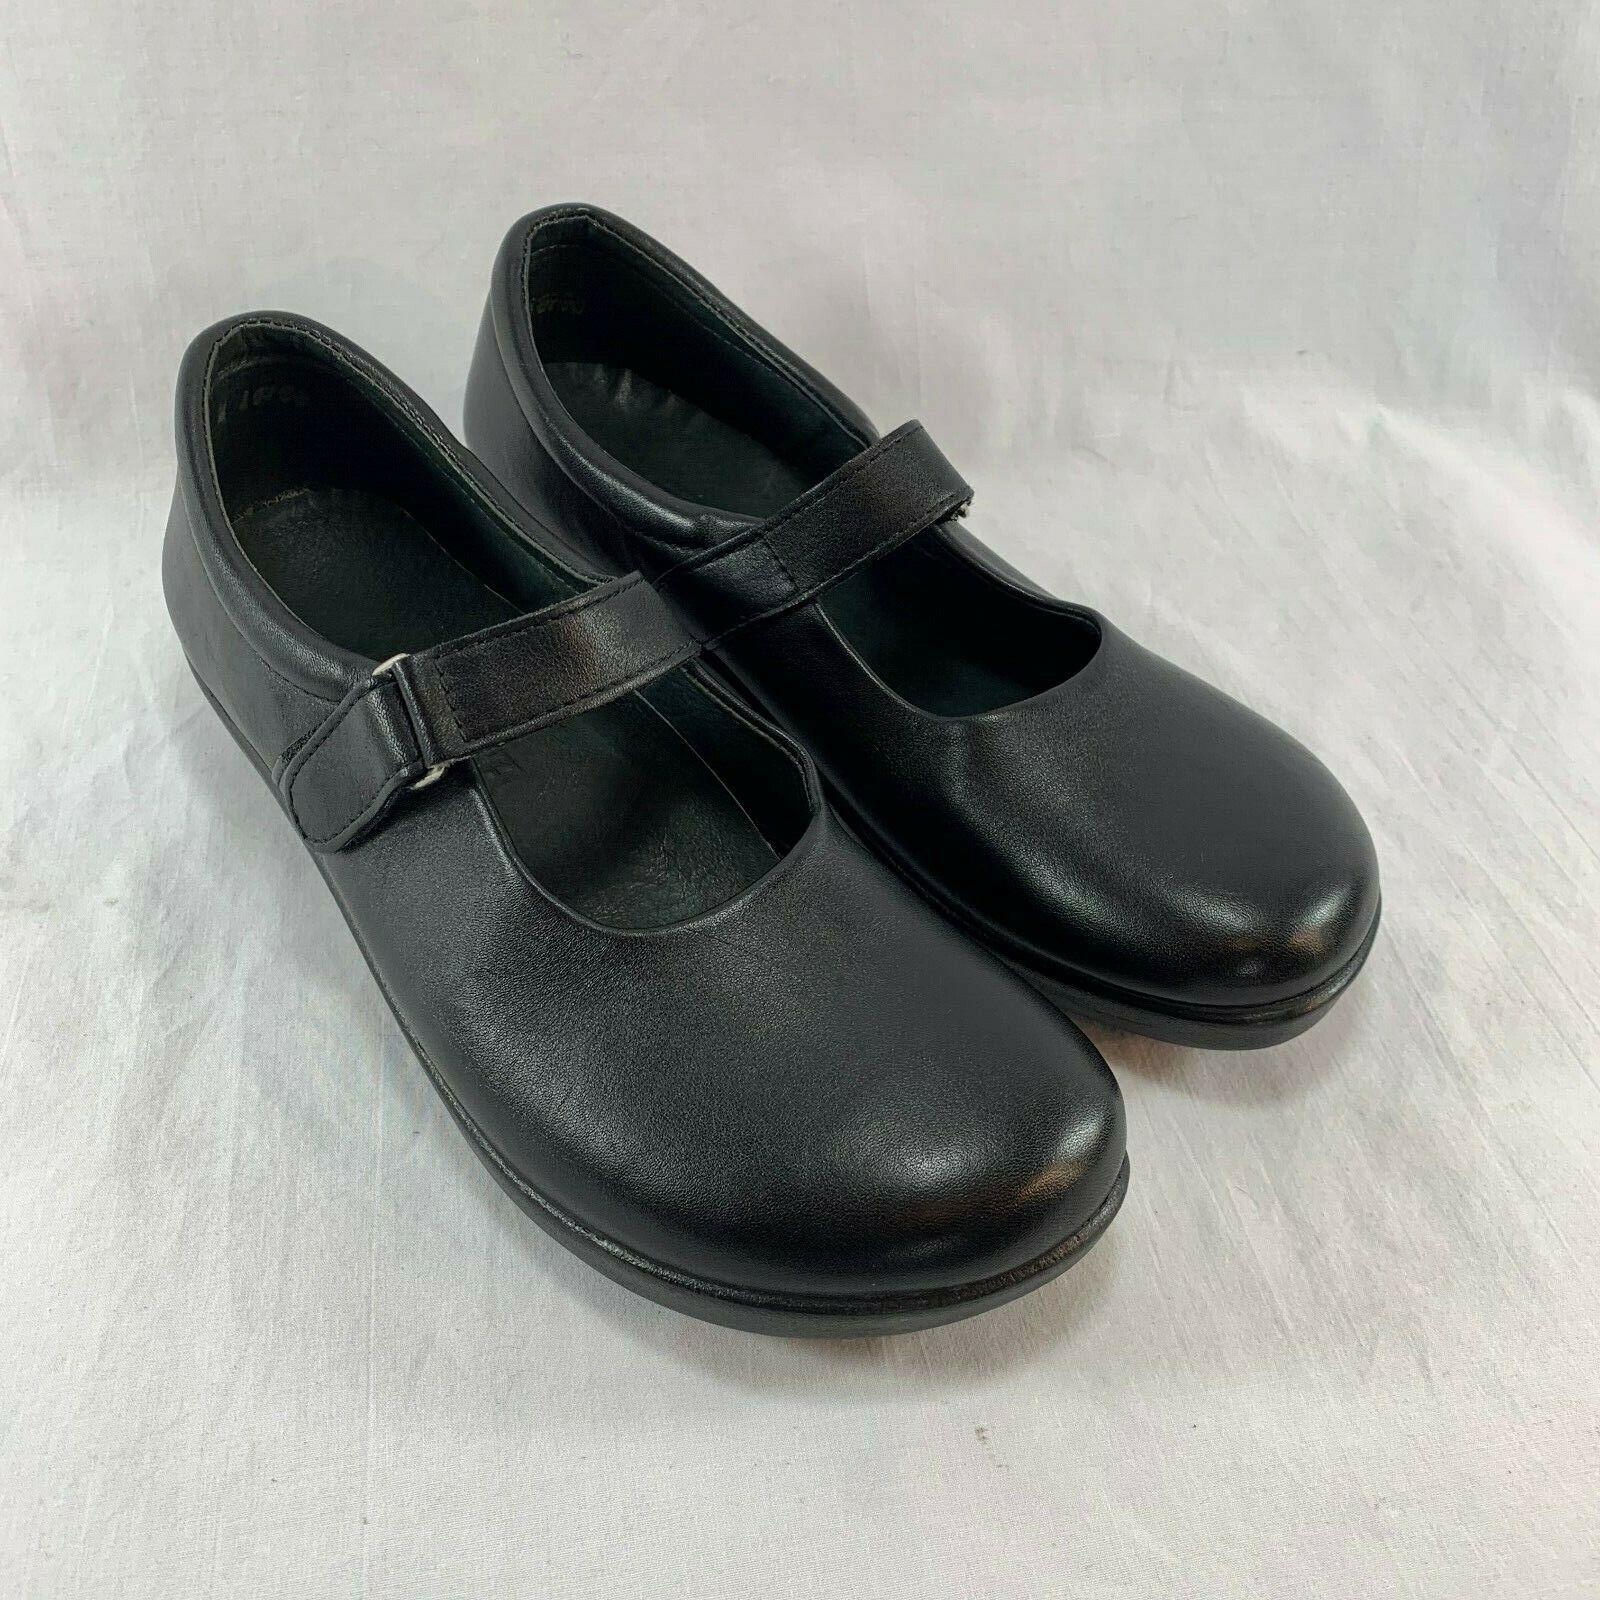 Ana Tech Fiona Orthopedic Maryjane Black Leather Shoes - Women's 11.5